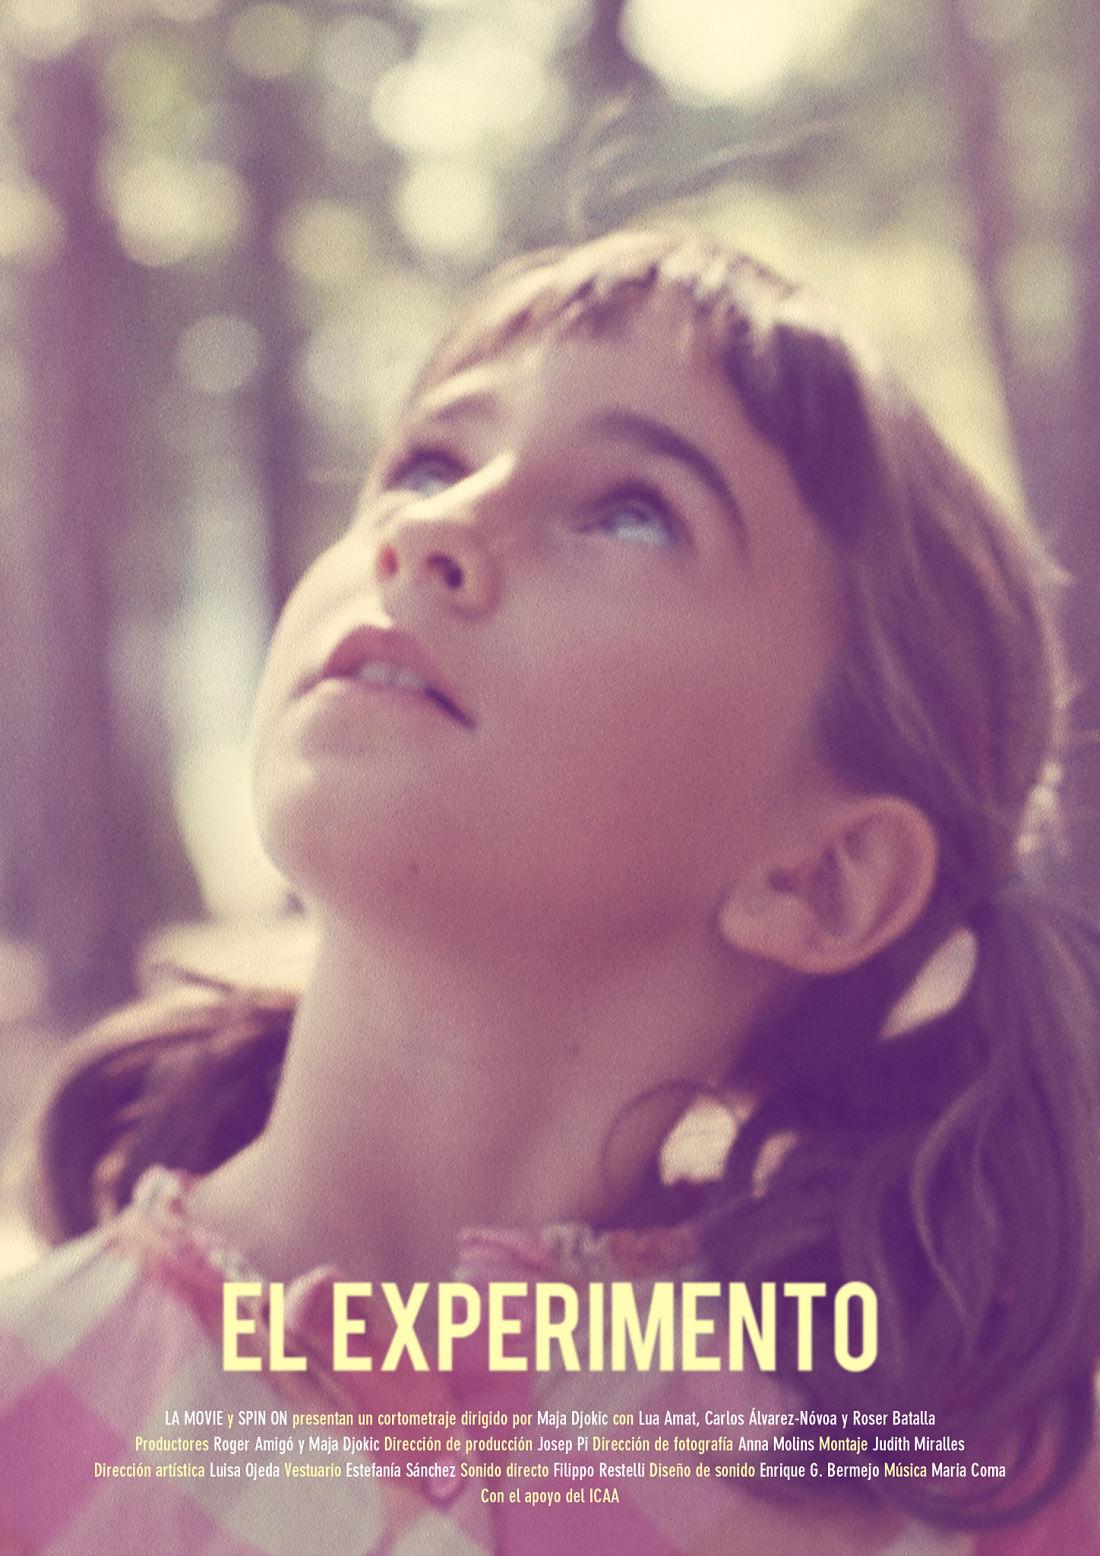 02 El experimento_opt